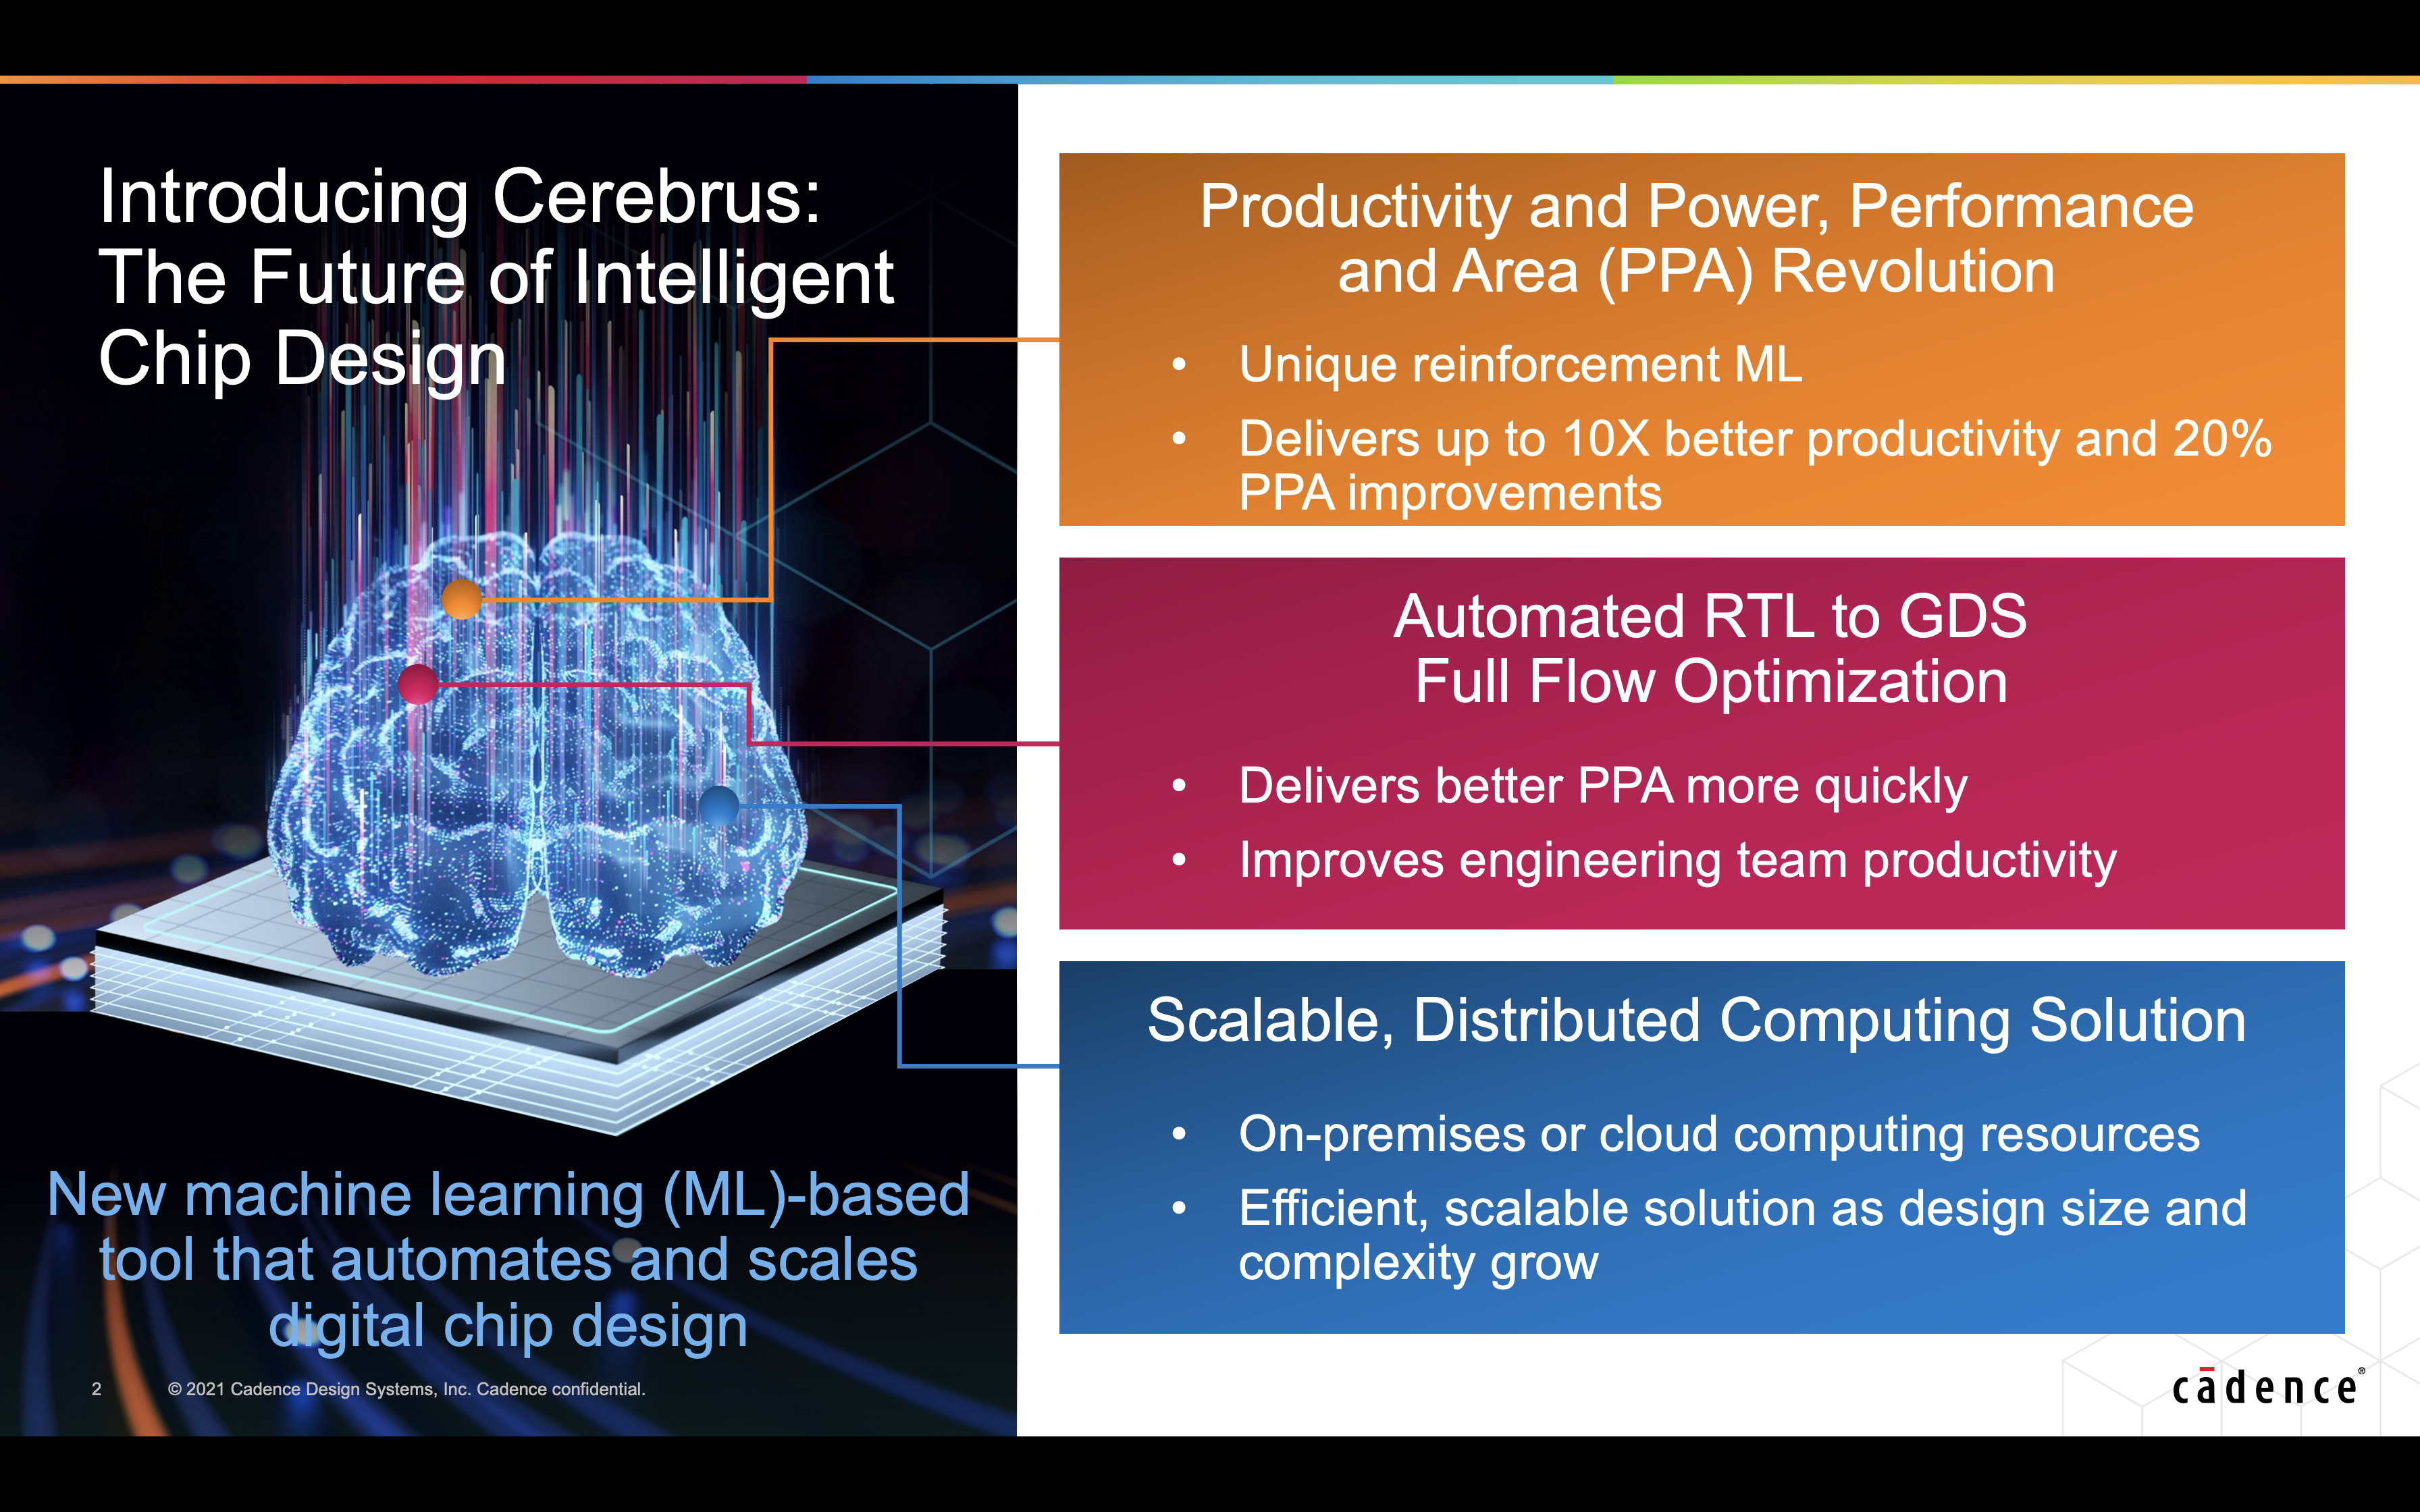 Cerebrus, the ML-based Intelligent Chip Explorer from Cadence